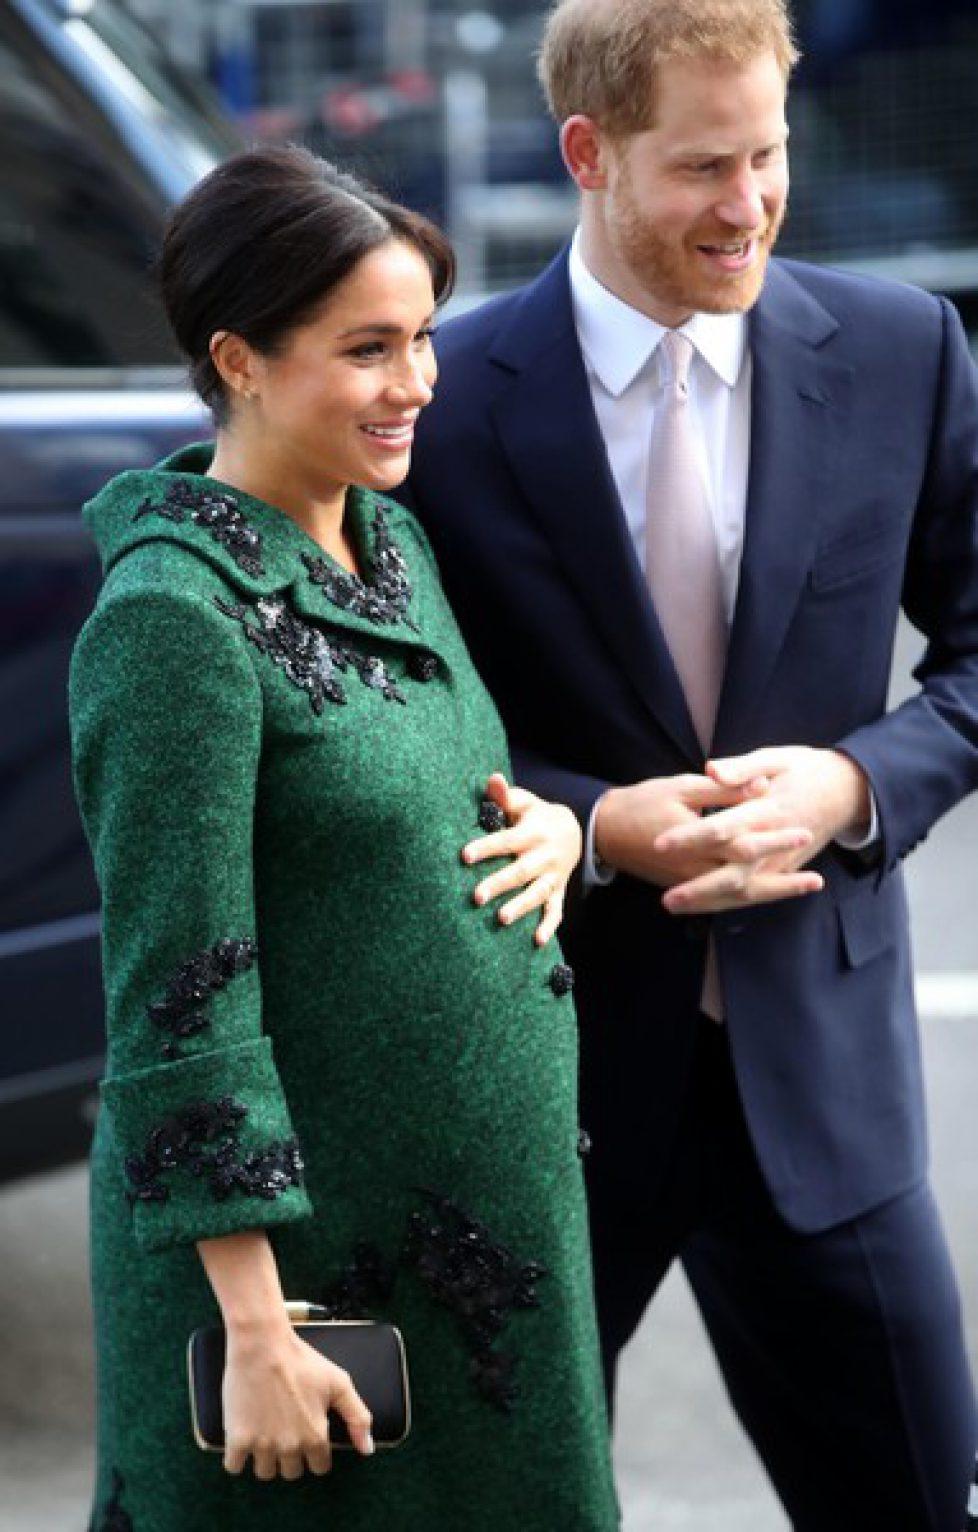 Duke+Duchess+Sussex+Attend+Commonwealth+Day+Zngm0HclvHgl